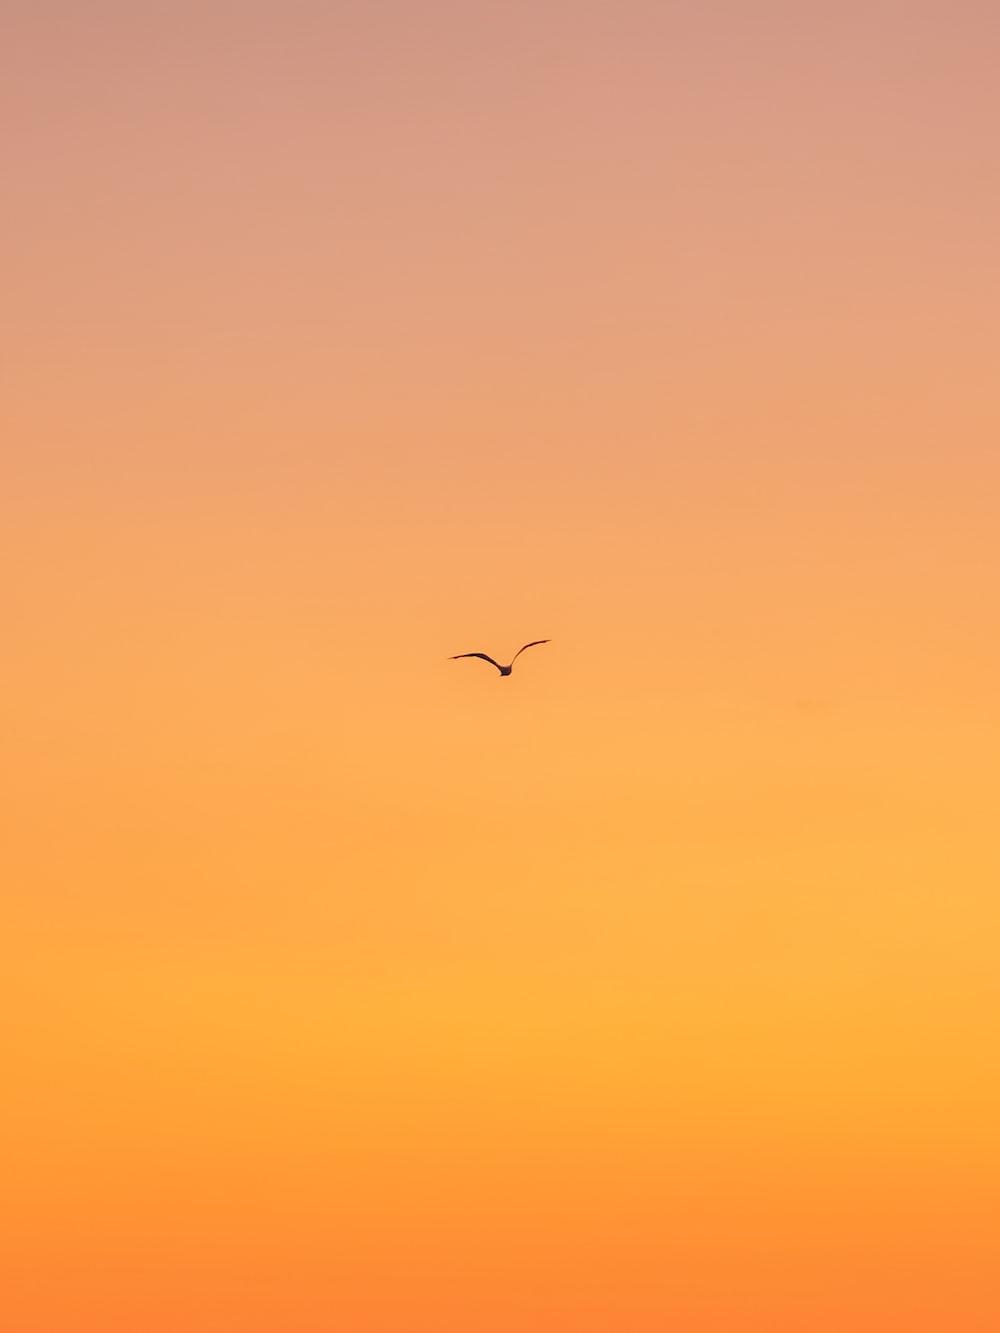 flying bird during daytime